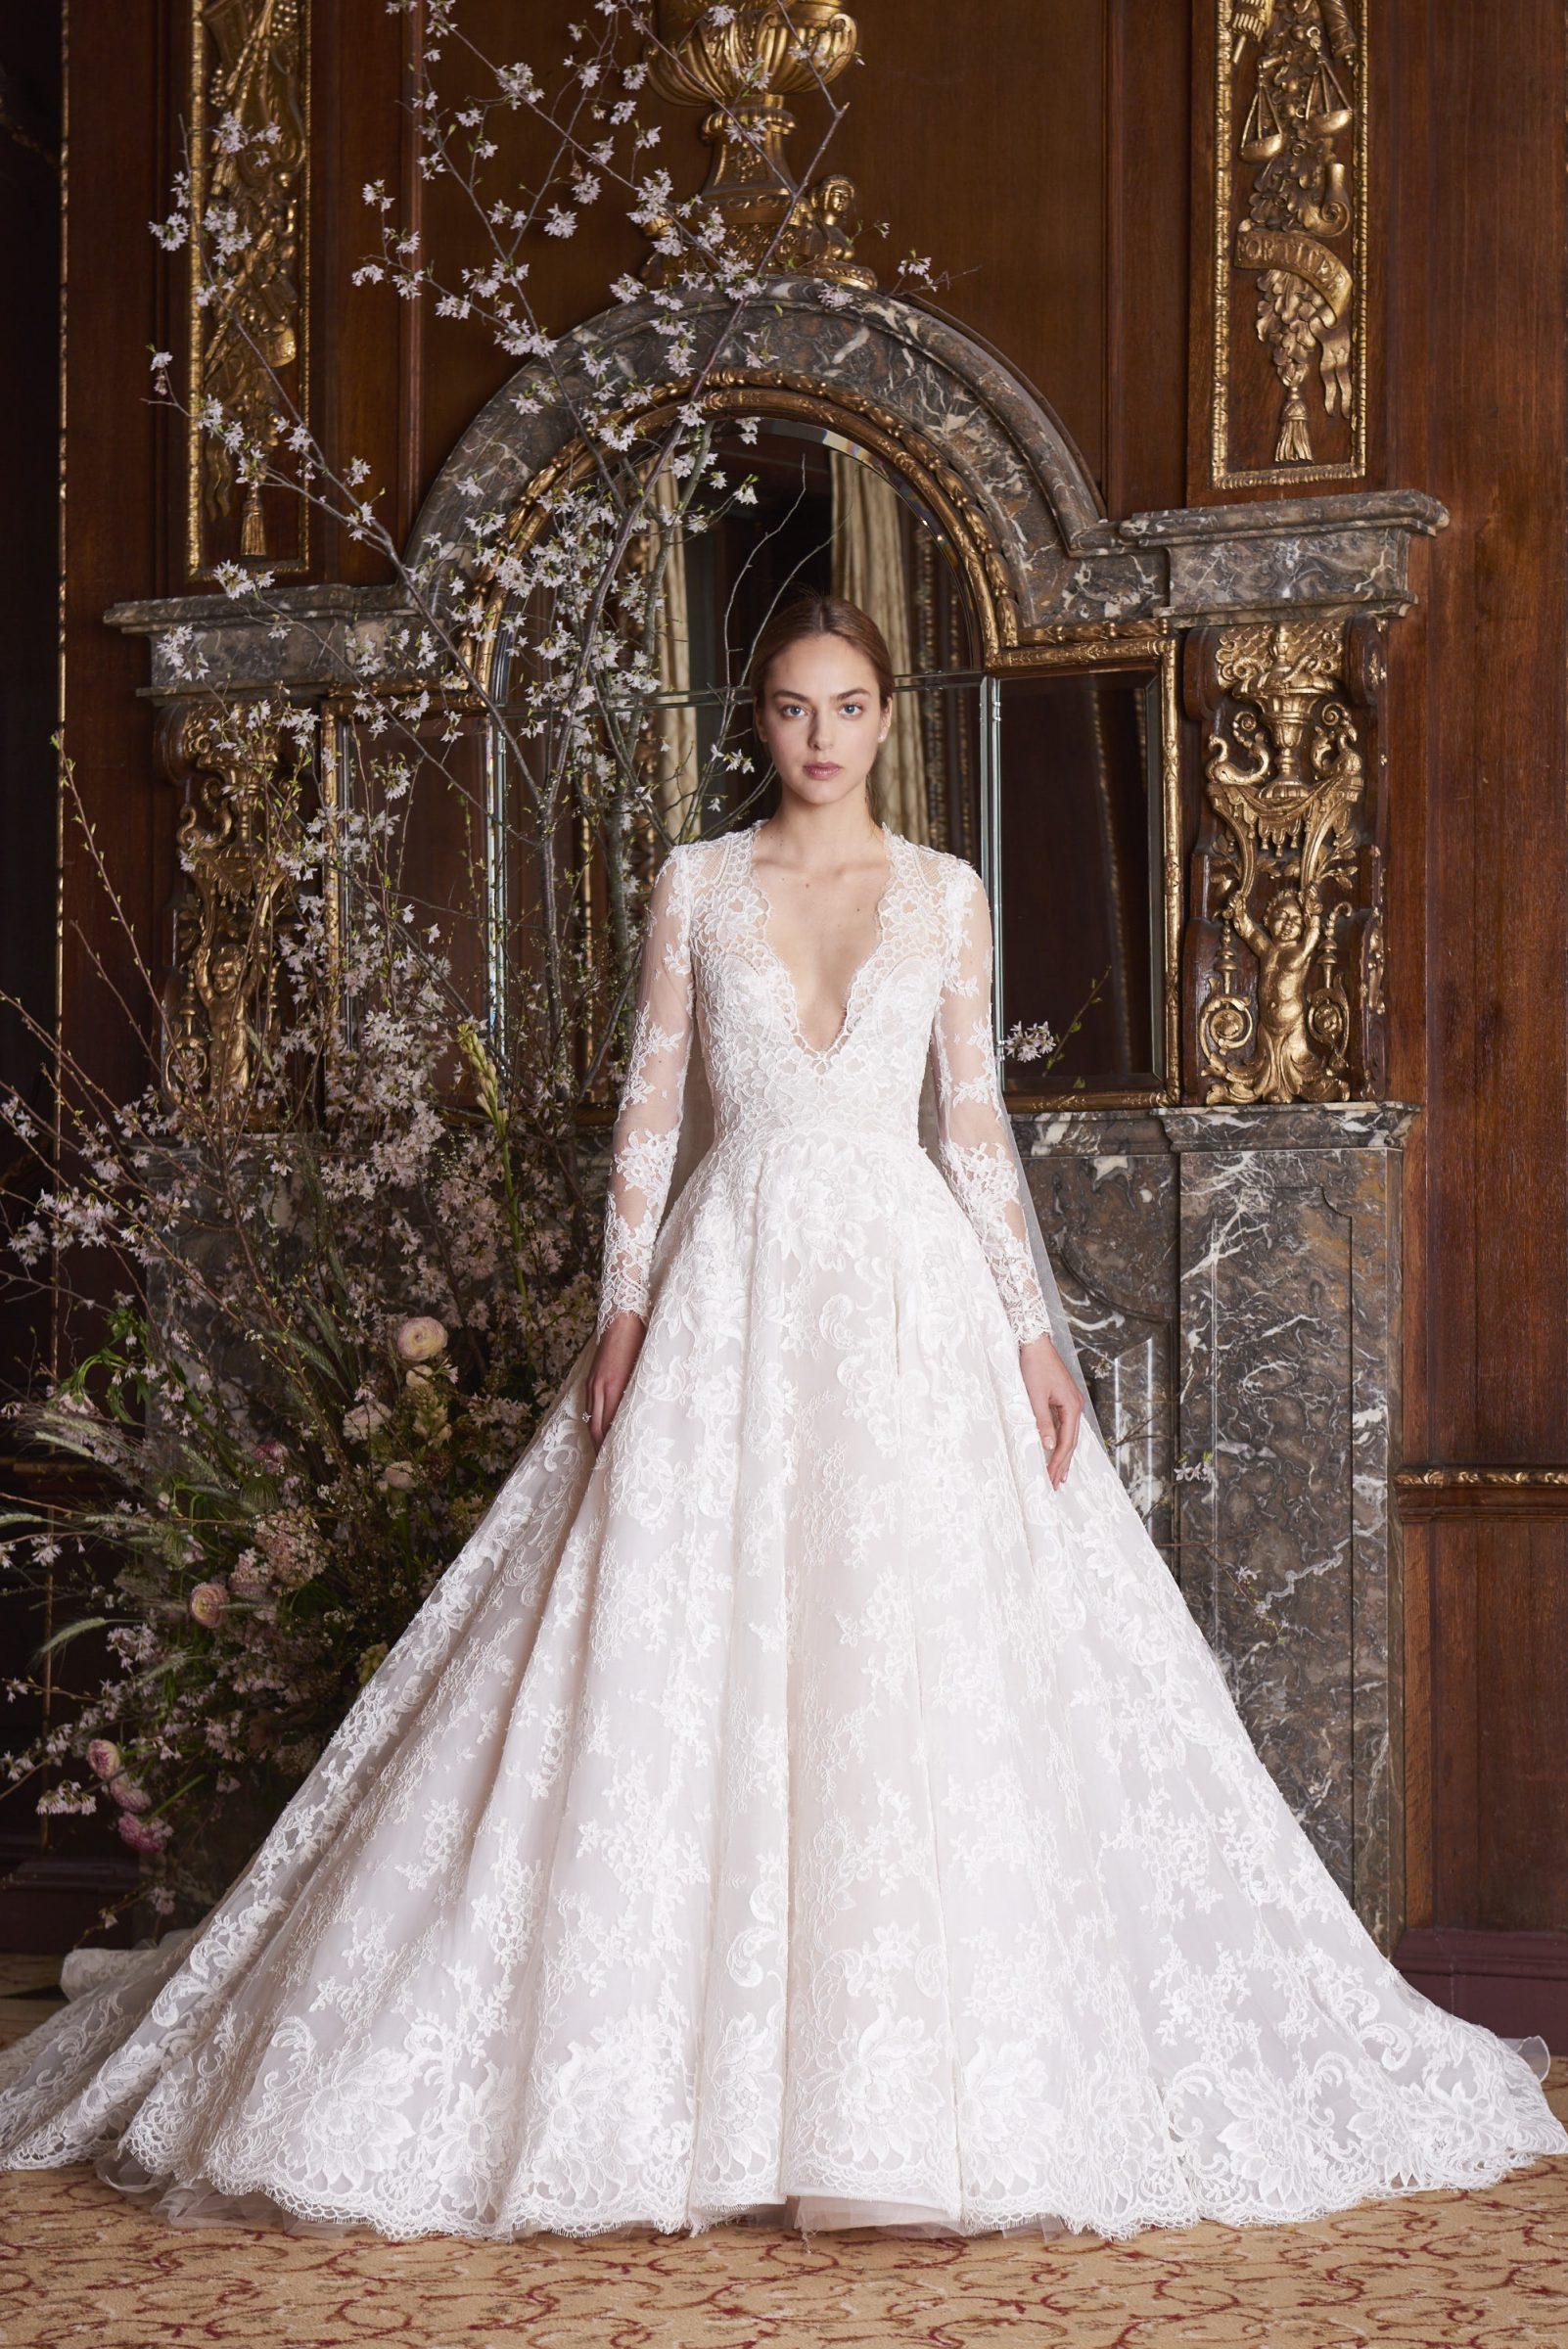 Spring Summer 2019 Nyc Bridal Fashion Week Recap The Wedding Guys